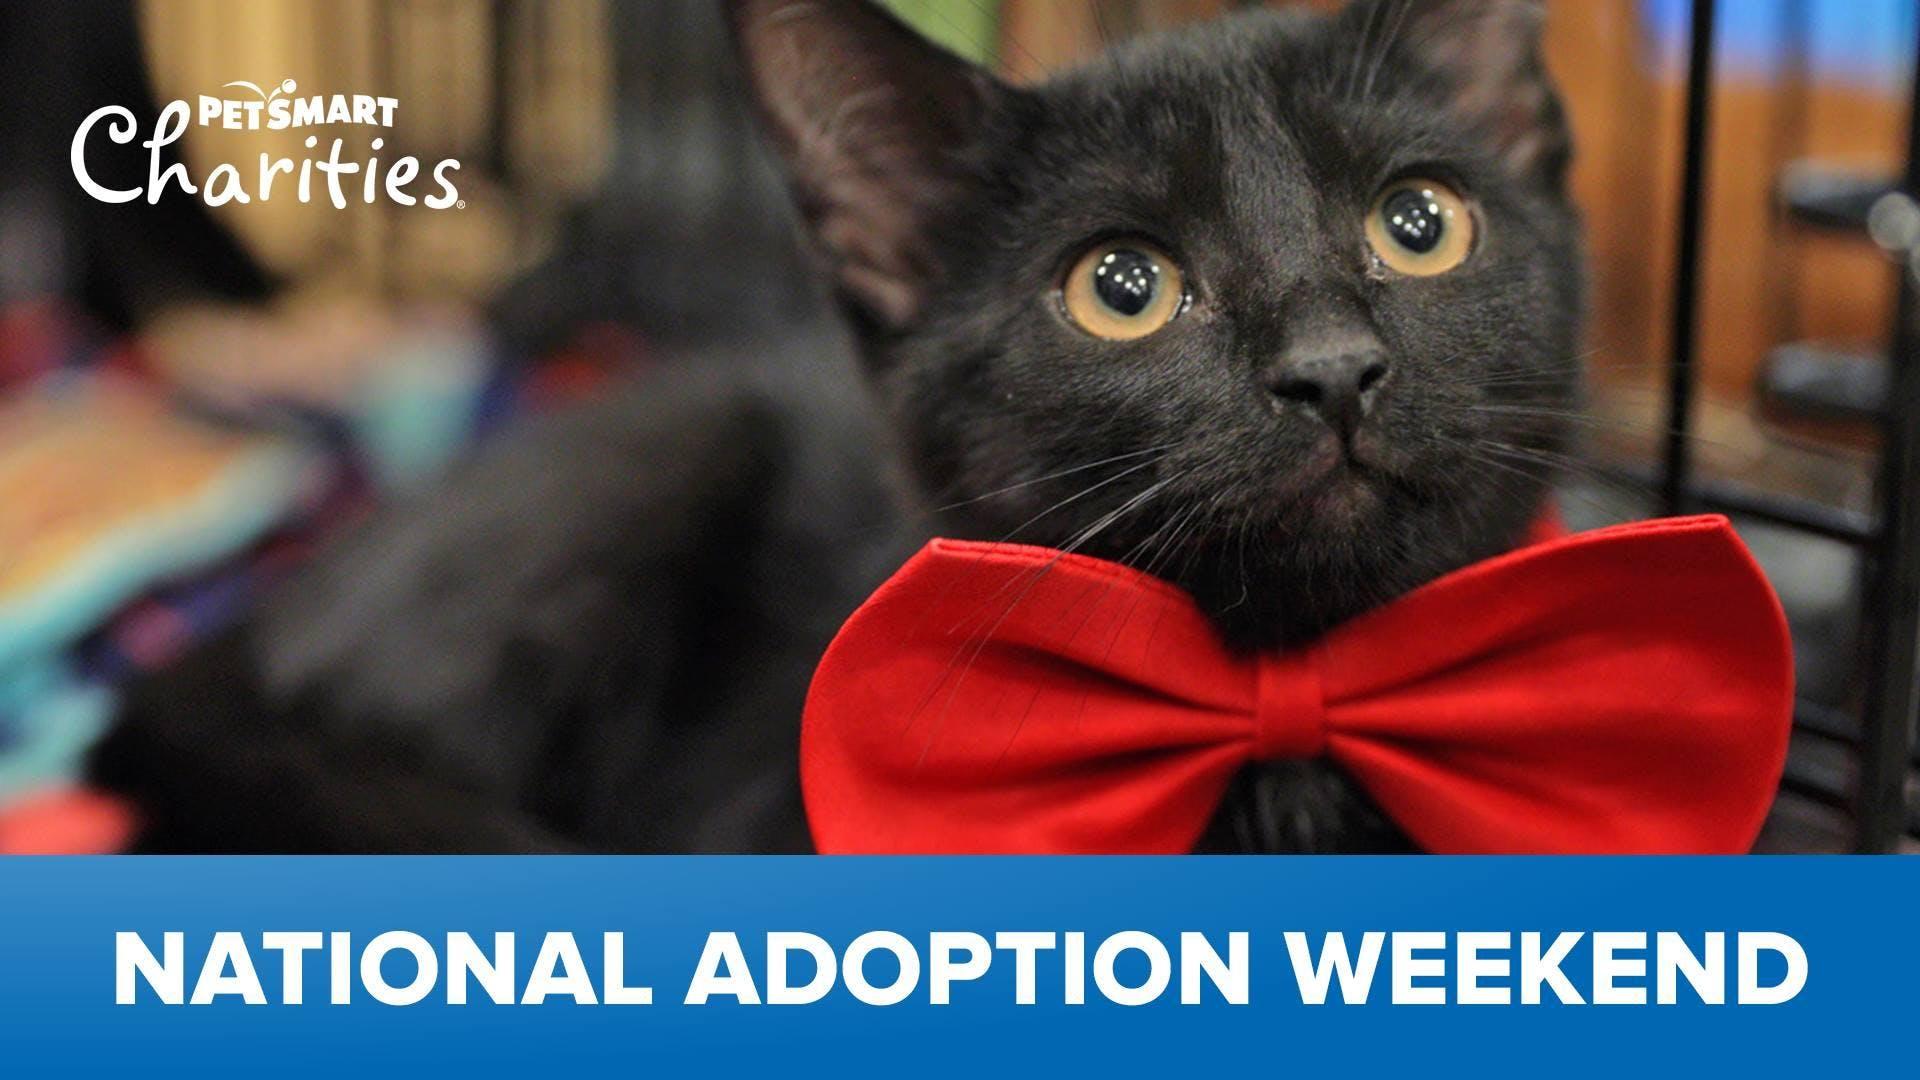 National Adoption Weekend